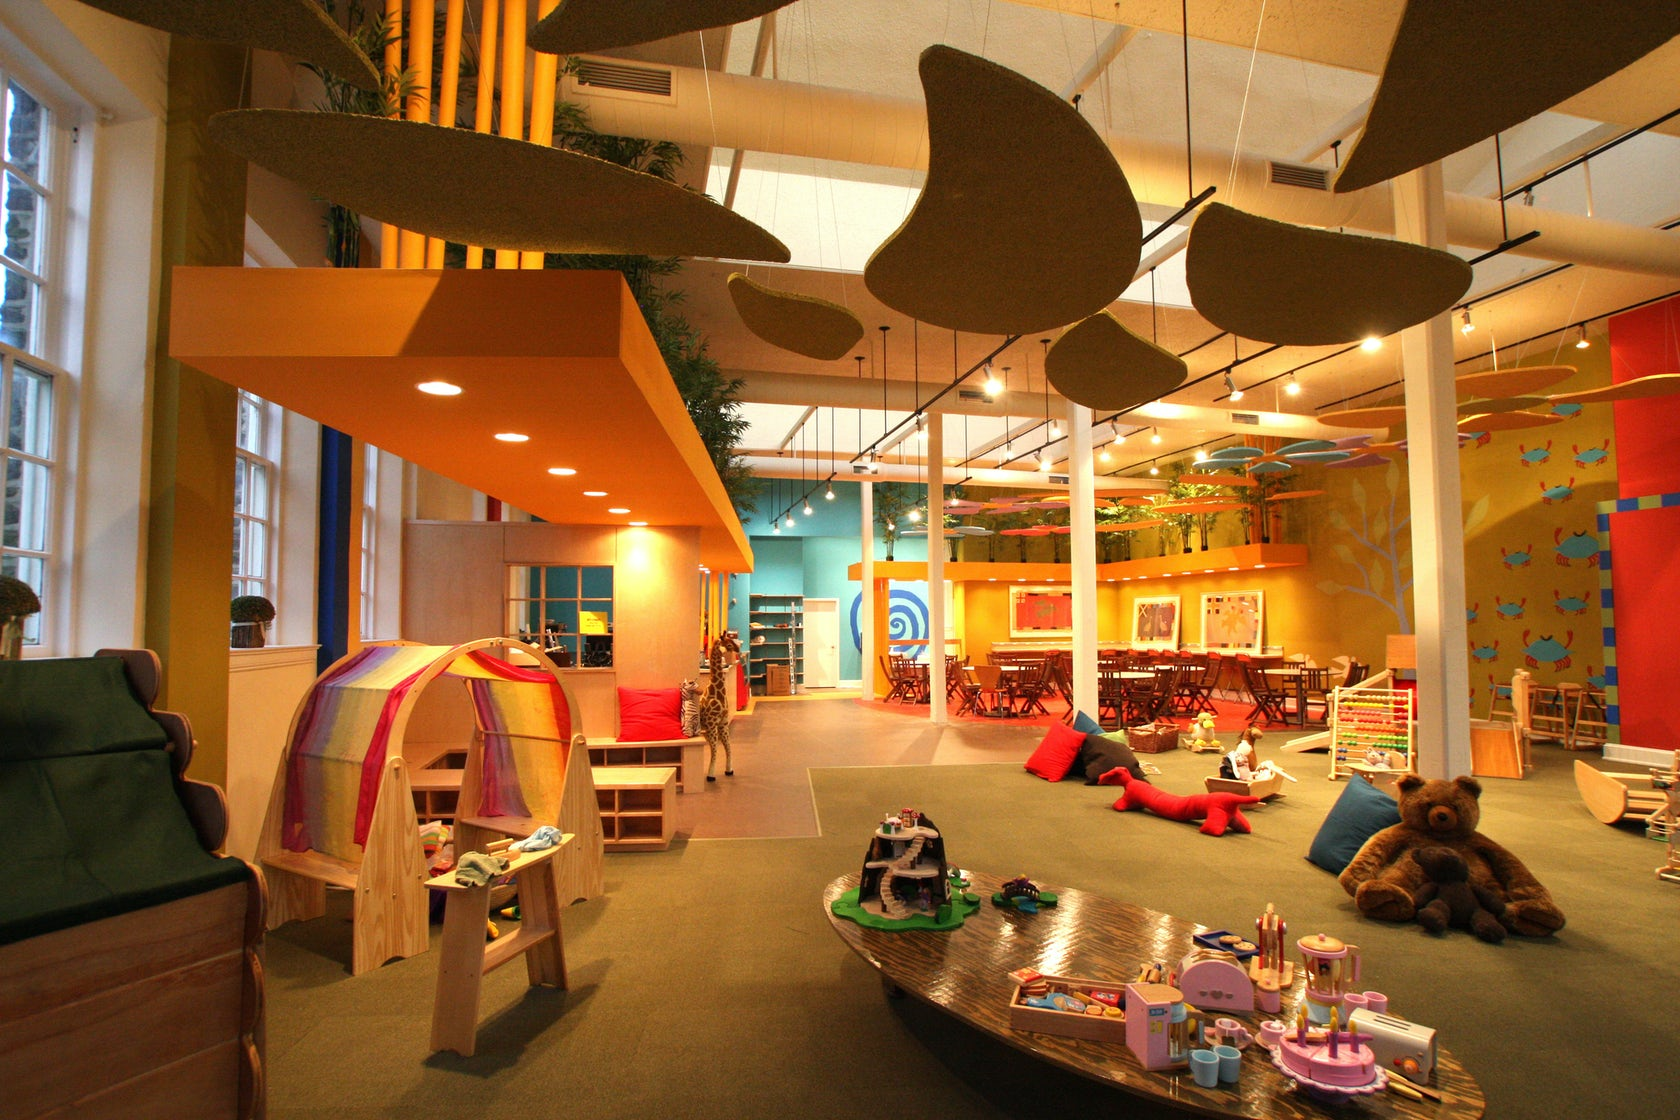 The little treehouse play cafe architizer - Interior design jobs philadelphia ...